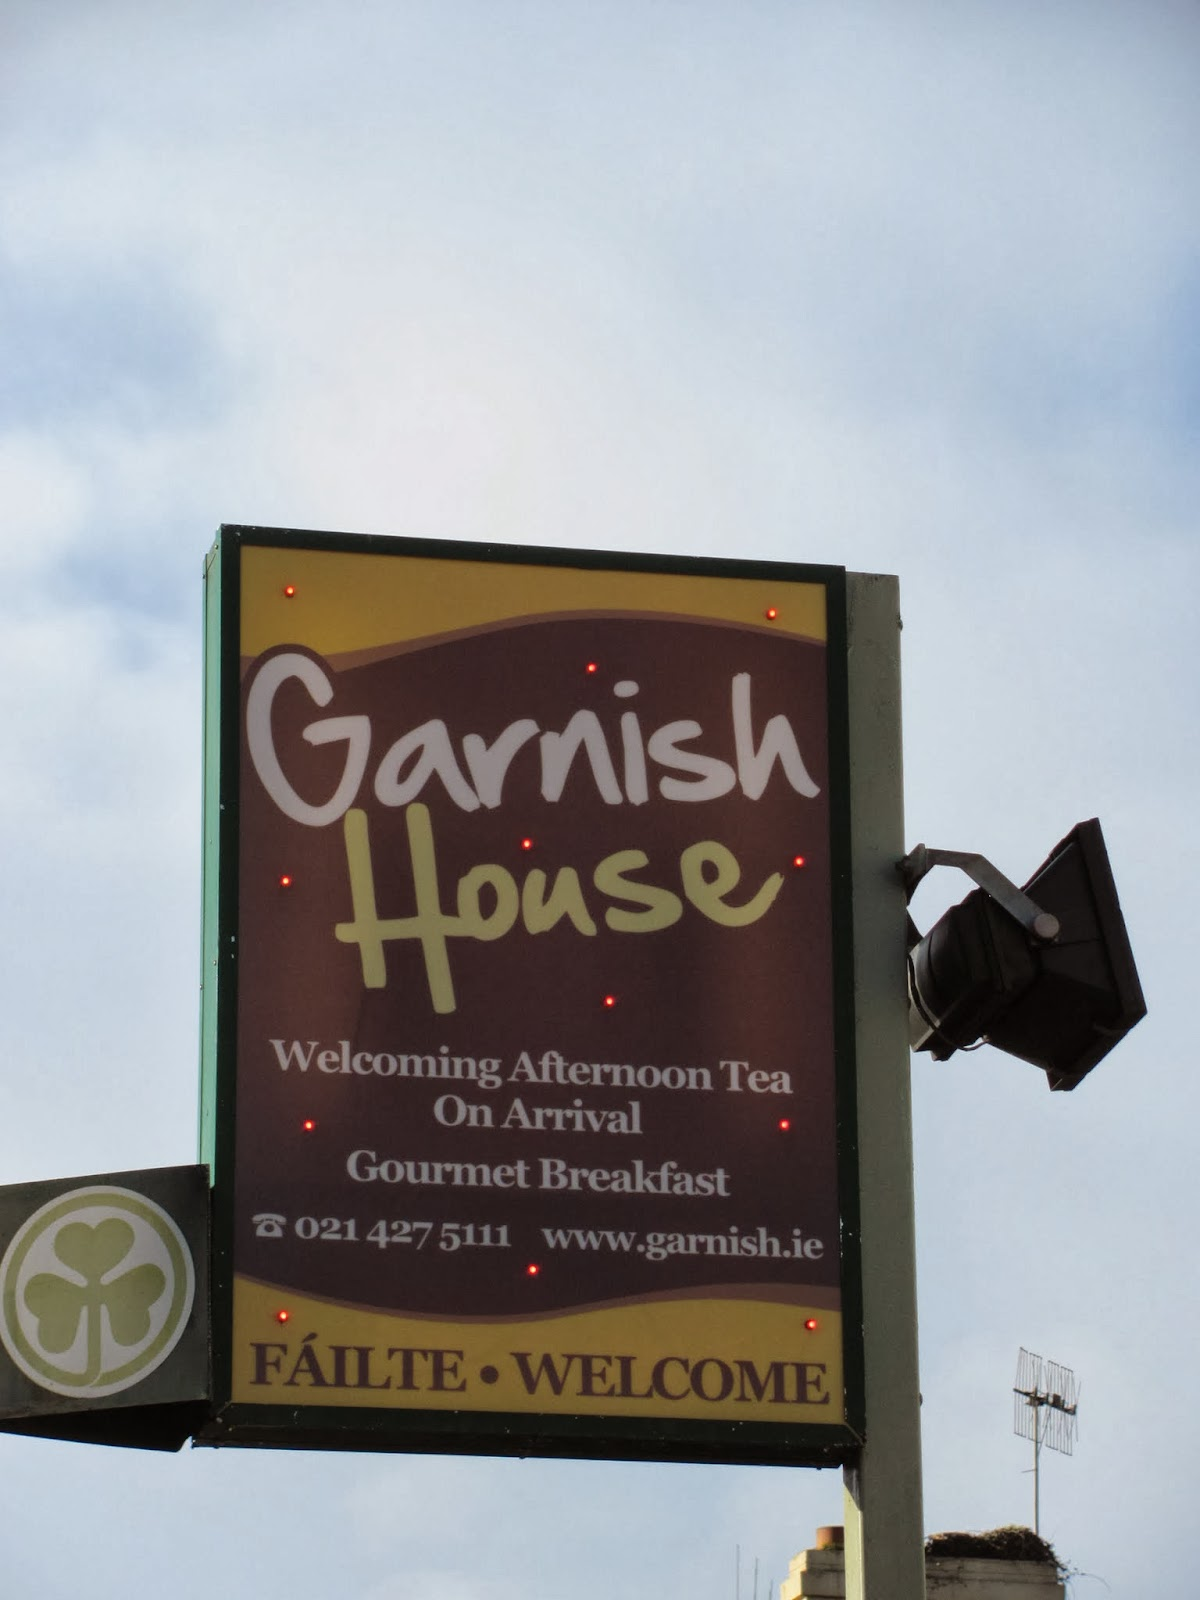 Sign for Garnish House, Cork, Ireland